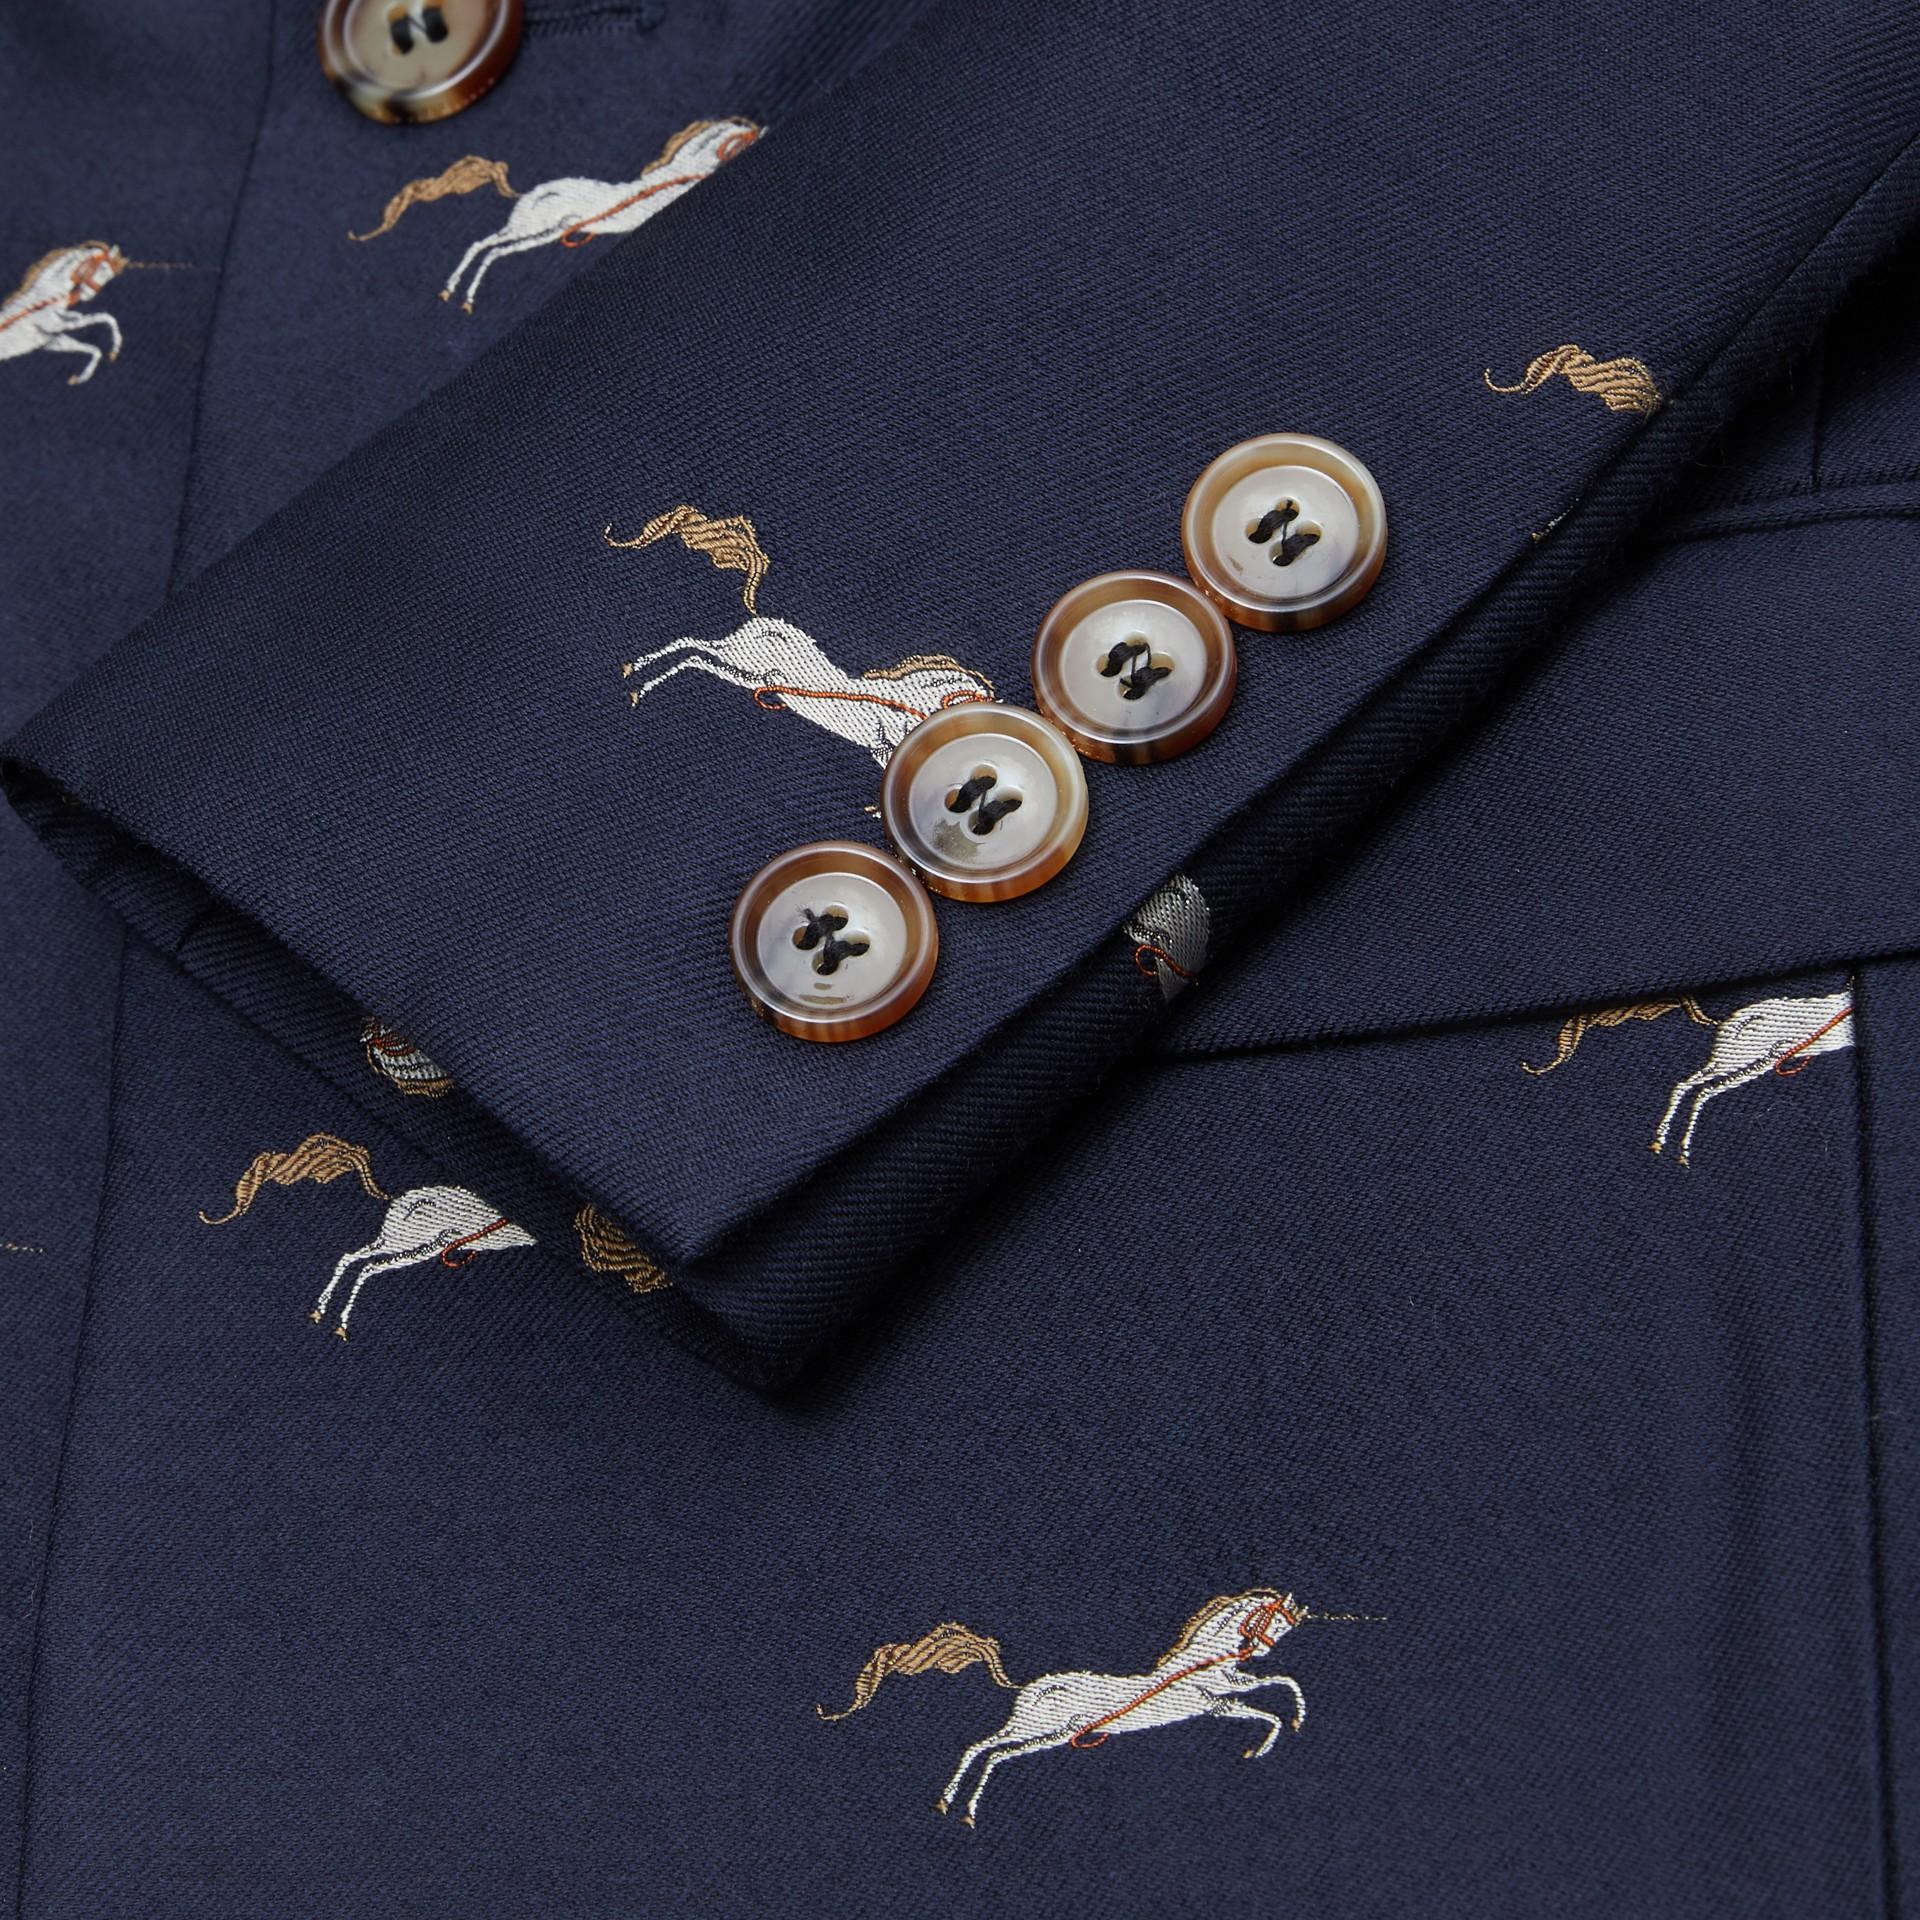 Unicorn Wool Silk Jacquard Blazer in Navy   Burberry United Kingdom - gallery image 1